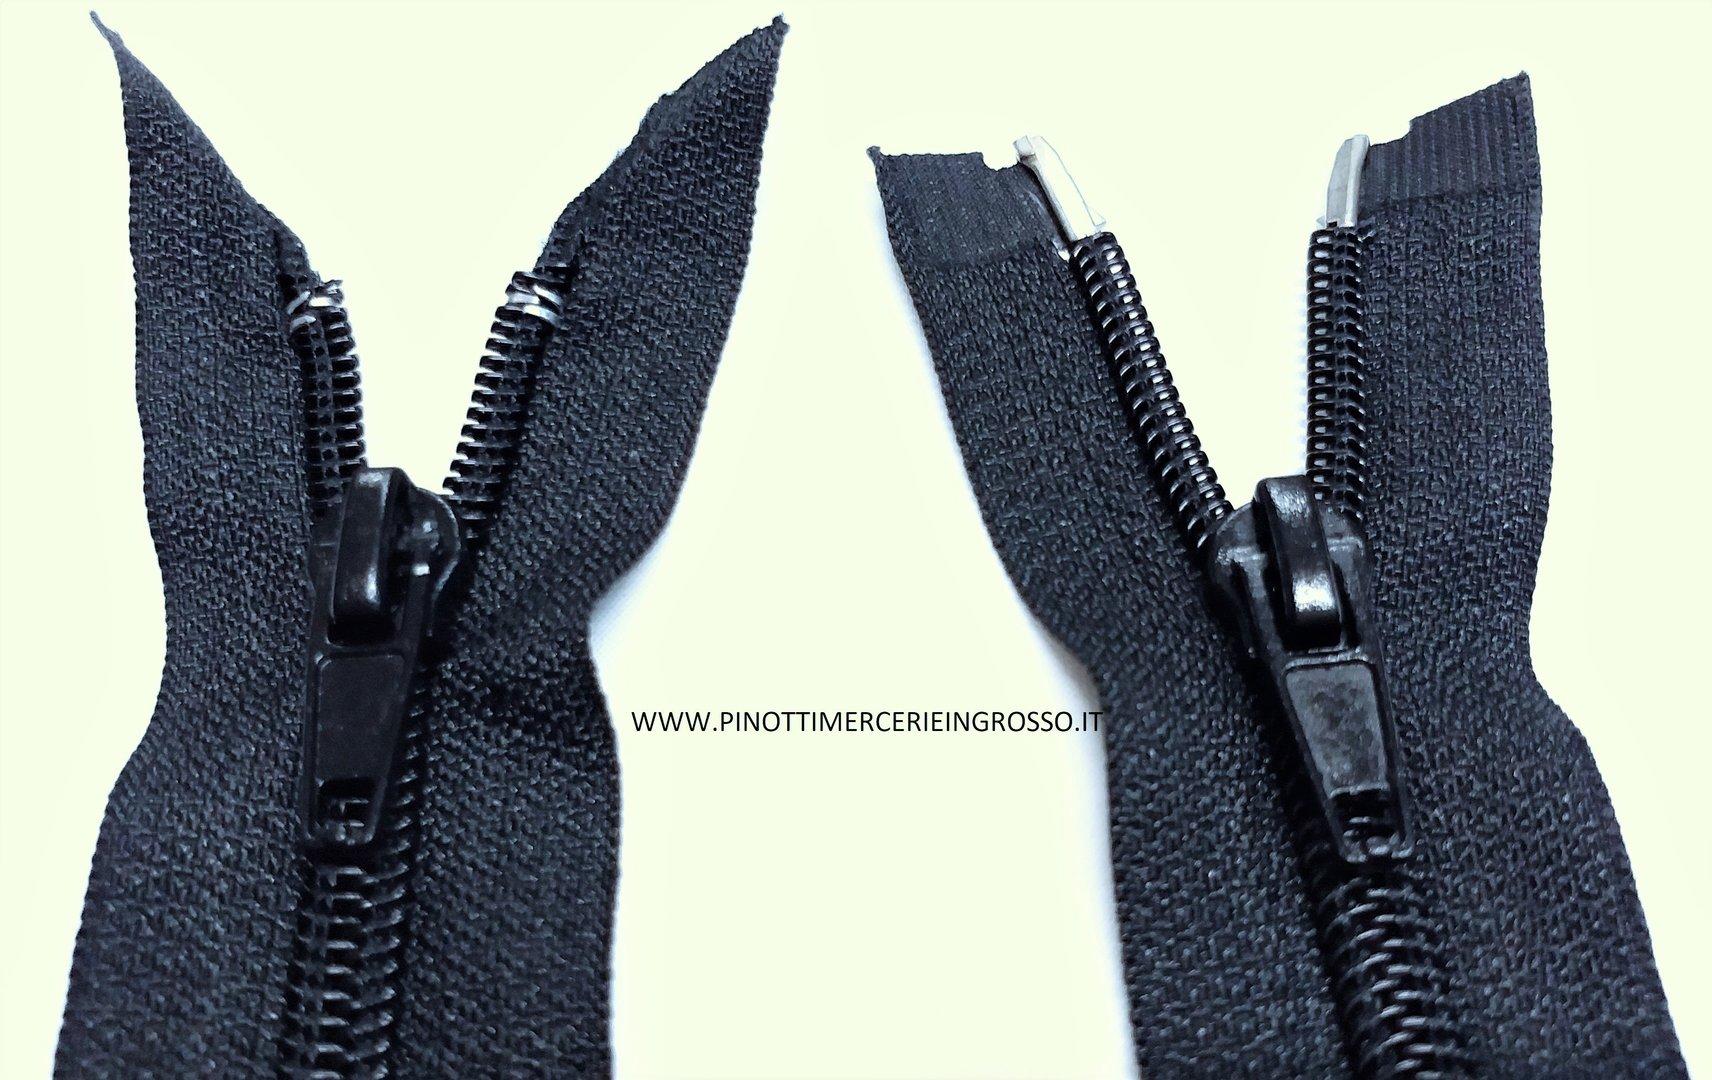 Pony Aluminio Doble Punta Aguja Tejer 2 1//2 Mm x 20cm 4 Pack P36603